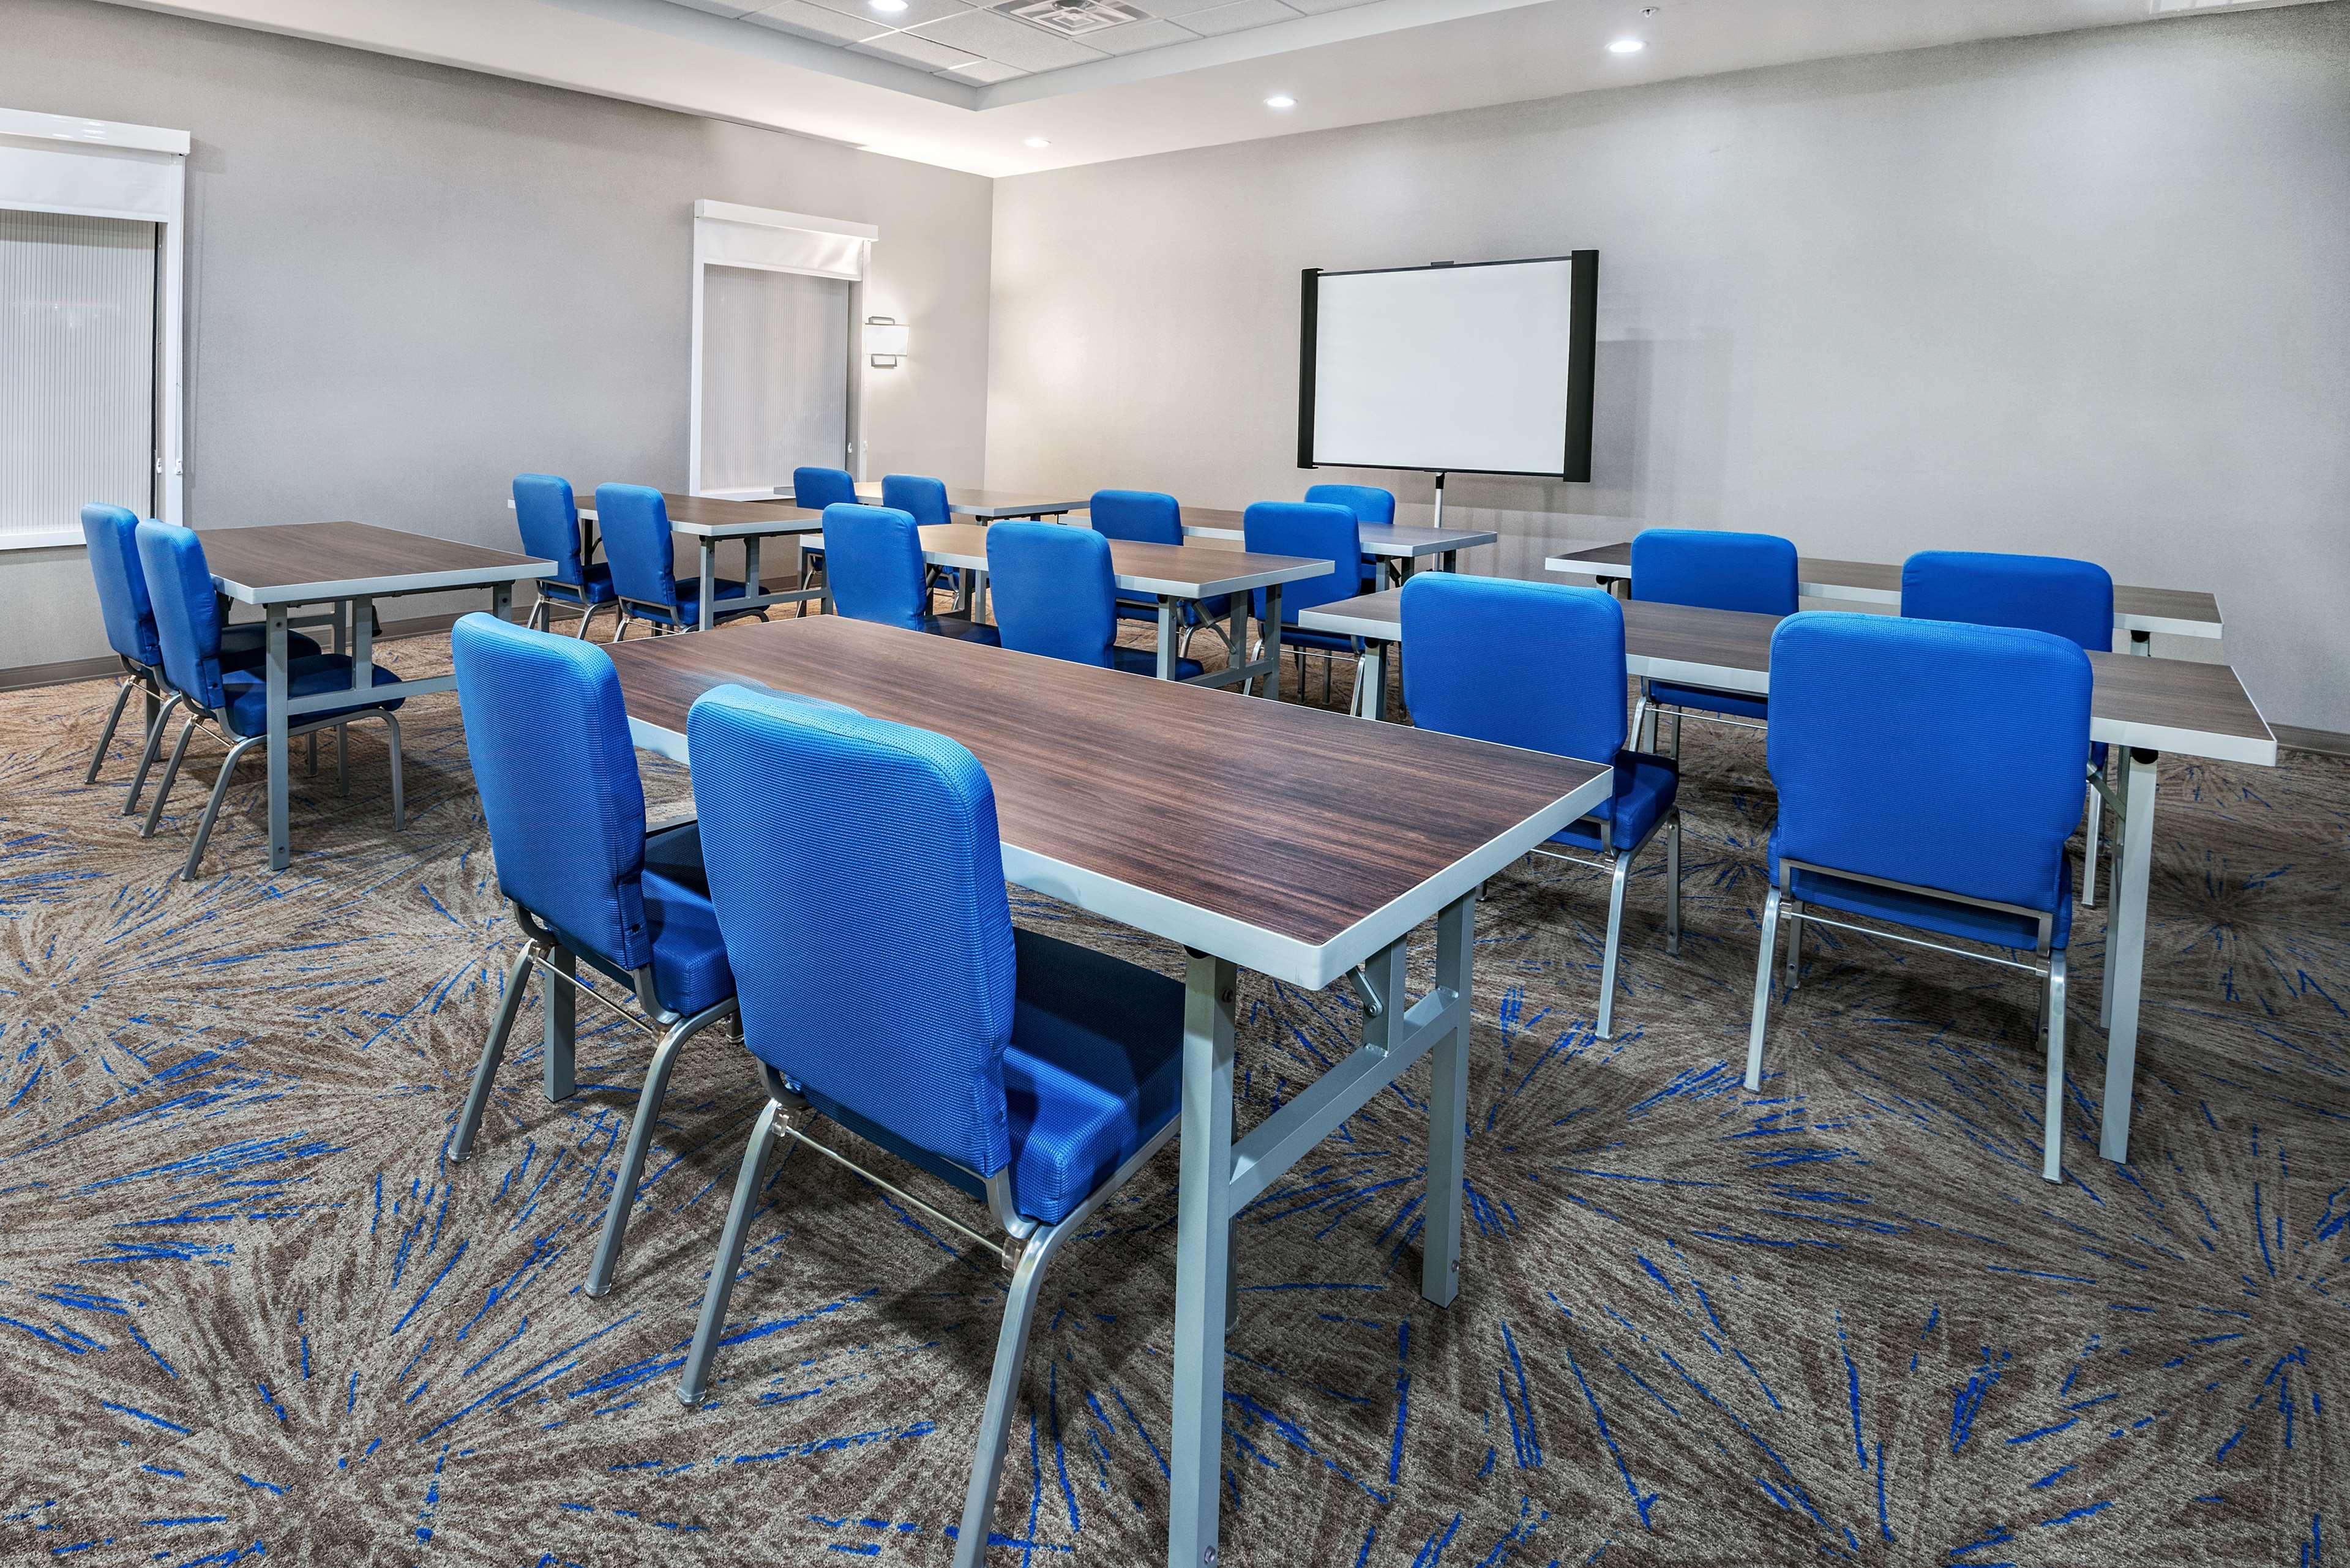 Home2 Suites by Hilton Austin Airport image 36